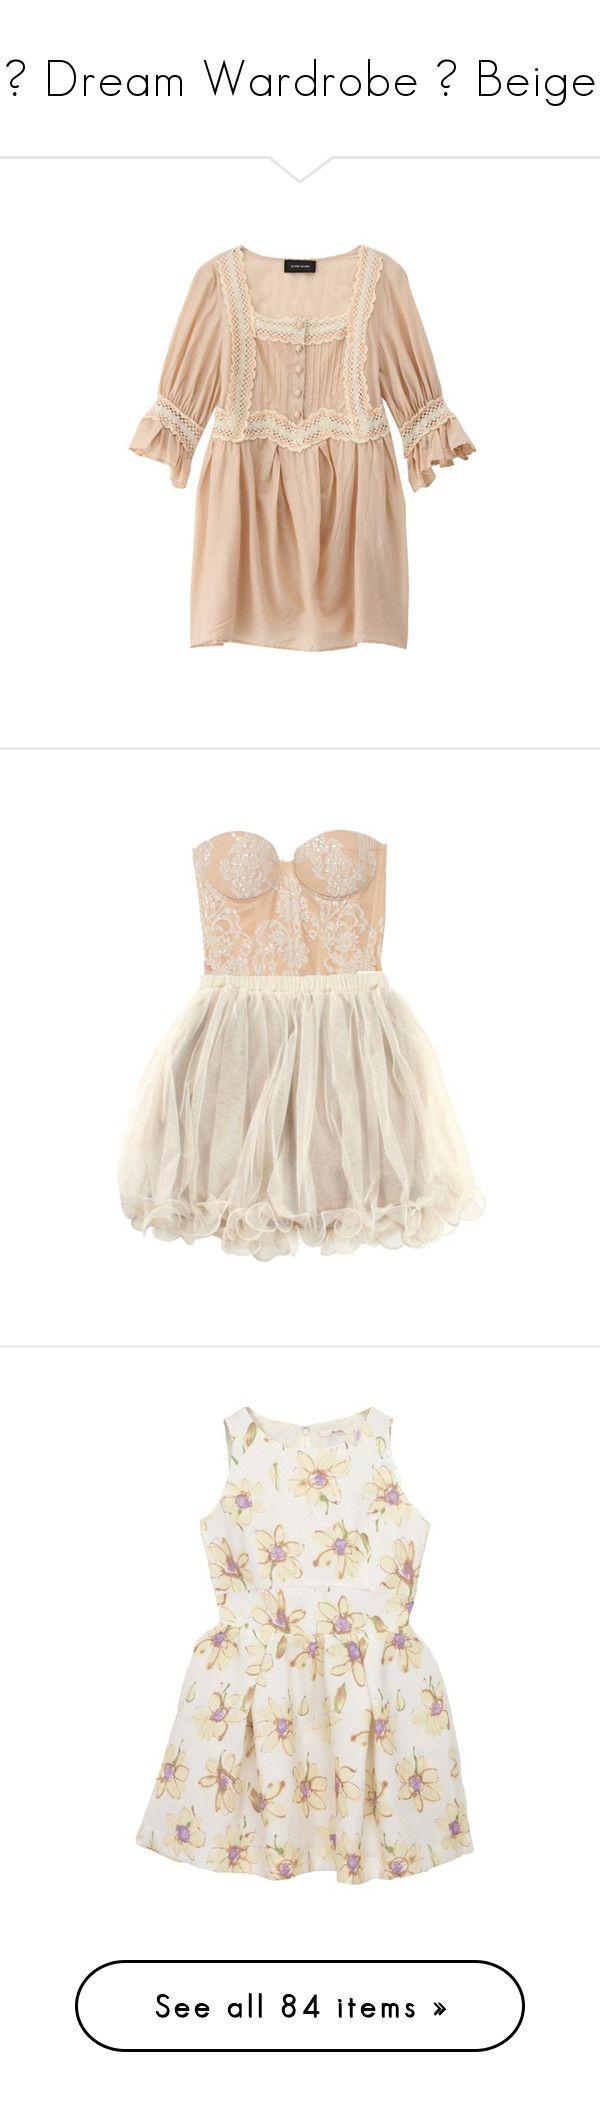 """♡ Dream Wardrobe ♡ Beige"" by elaine-elizabethxo ❤ liked on Polyvore featuring dresses, tops, shirts, vestidos, women, short dresses, sukienki, peach ruffle dress, flutter-sleeve dress and mini dress"